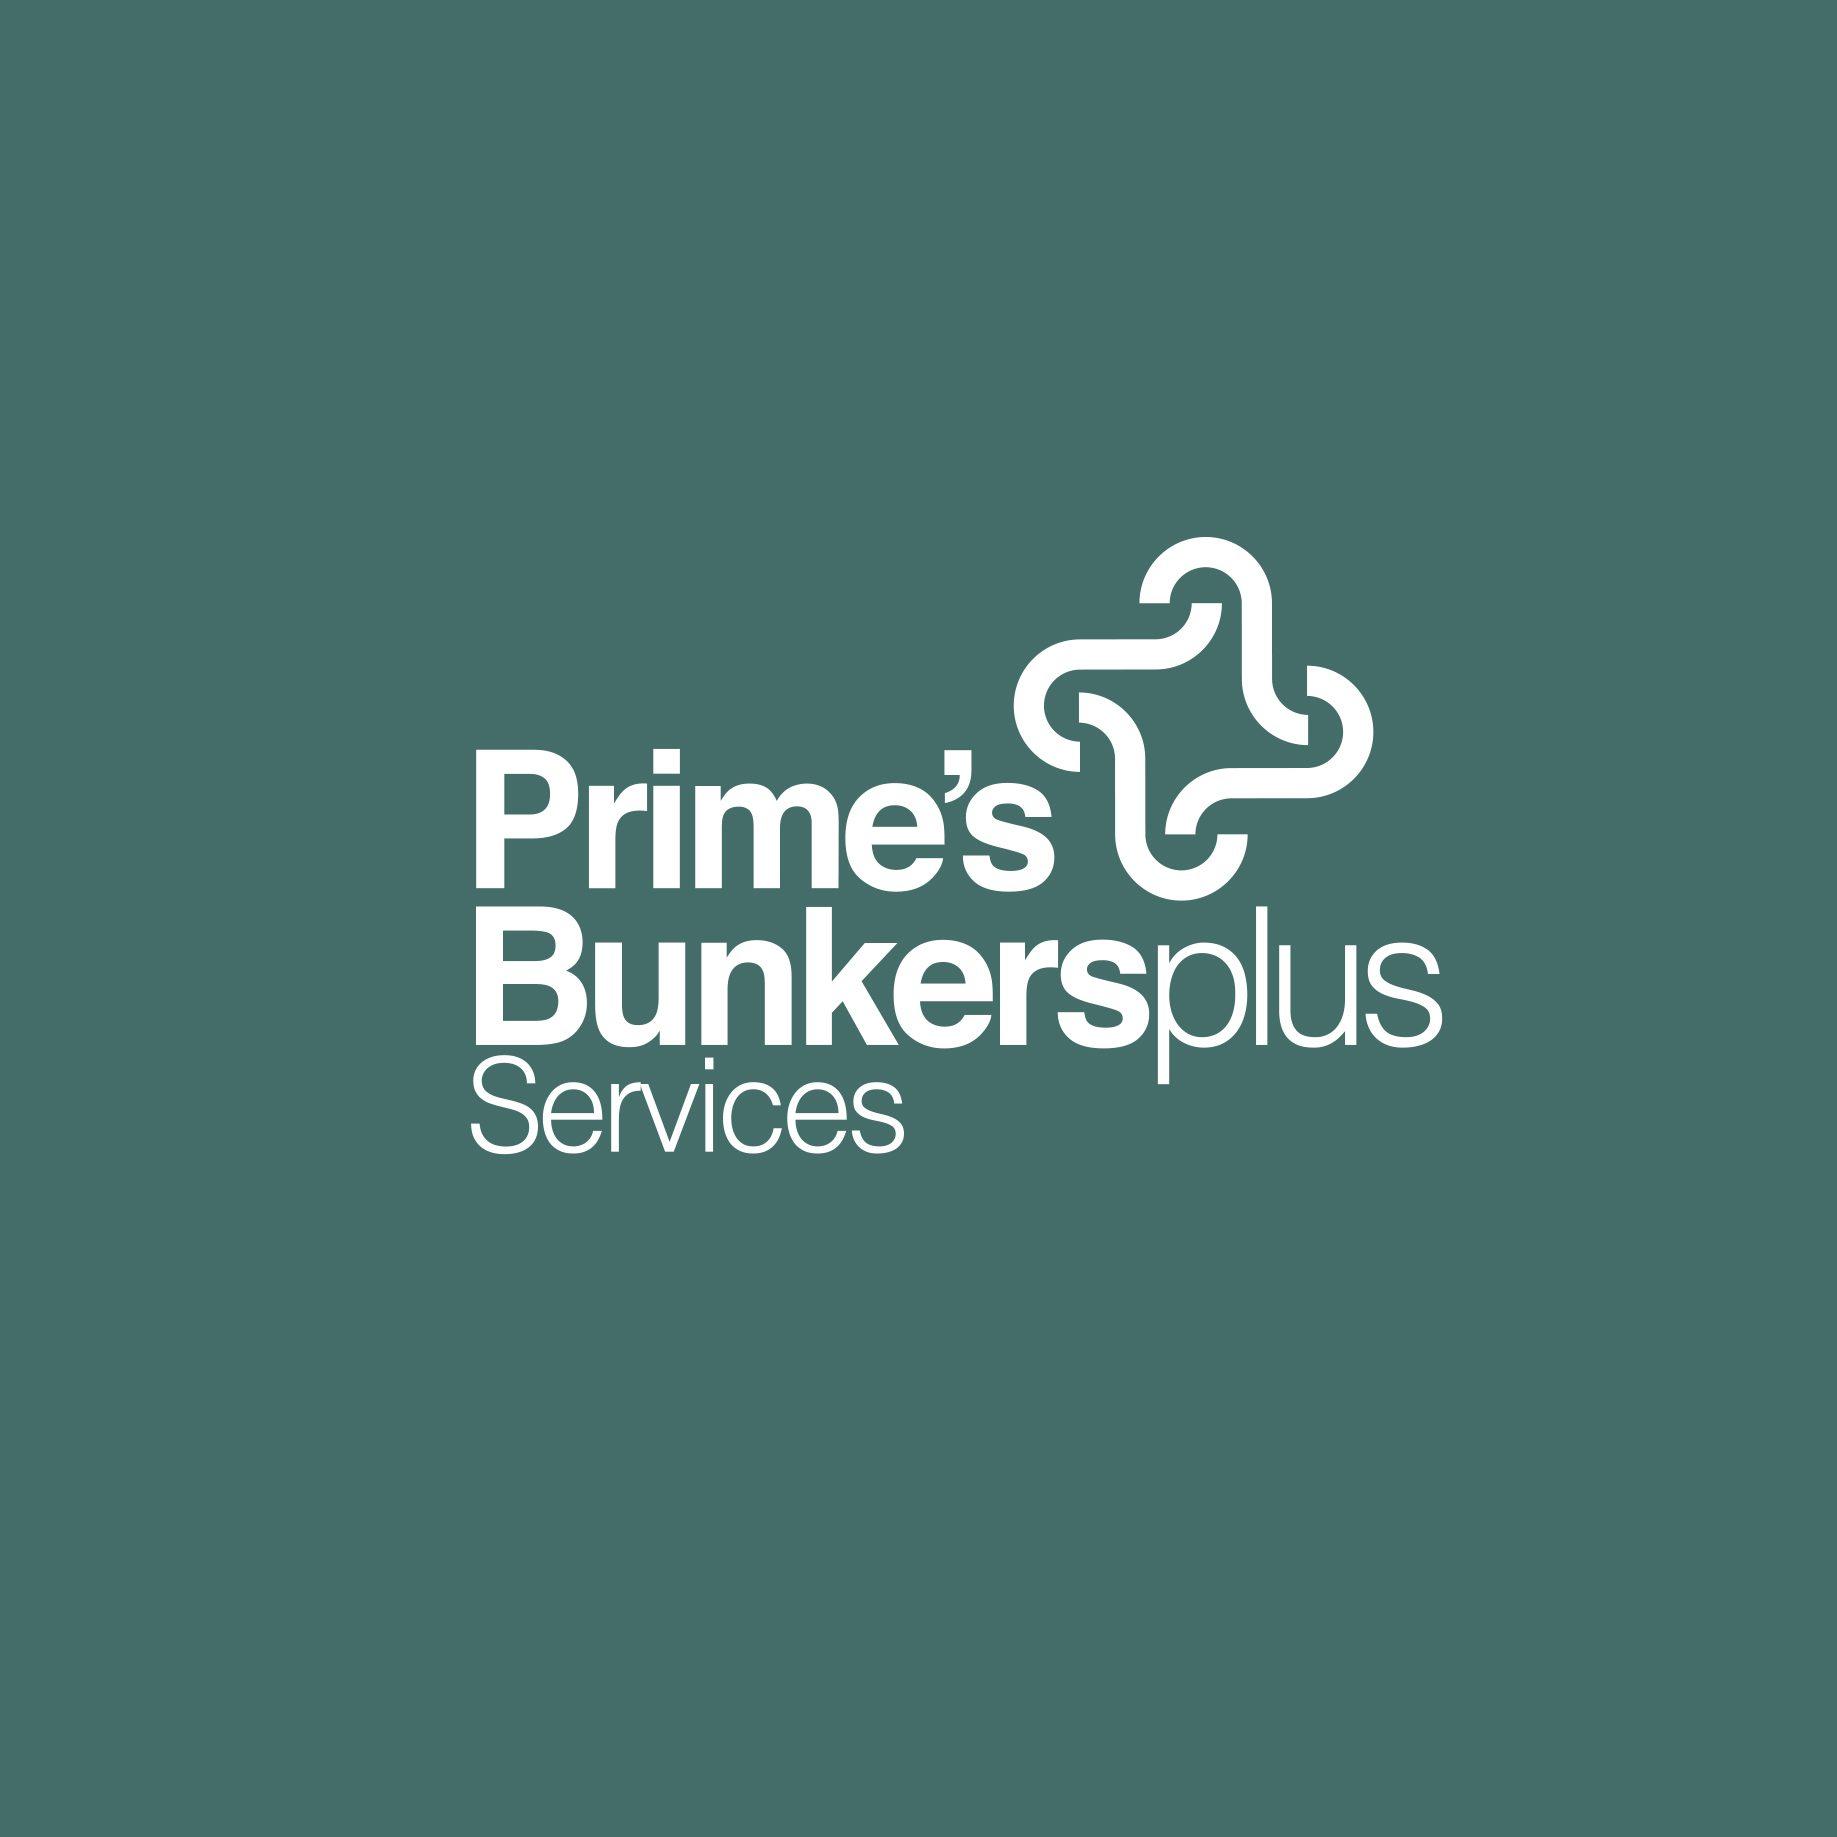 PRIME'S BUNKERSPLUS SERVICES – Ε. ΝΟΤΙΑ ΚΑΙ ΣΙΑ ΕΕ